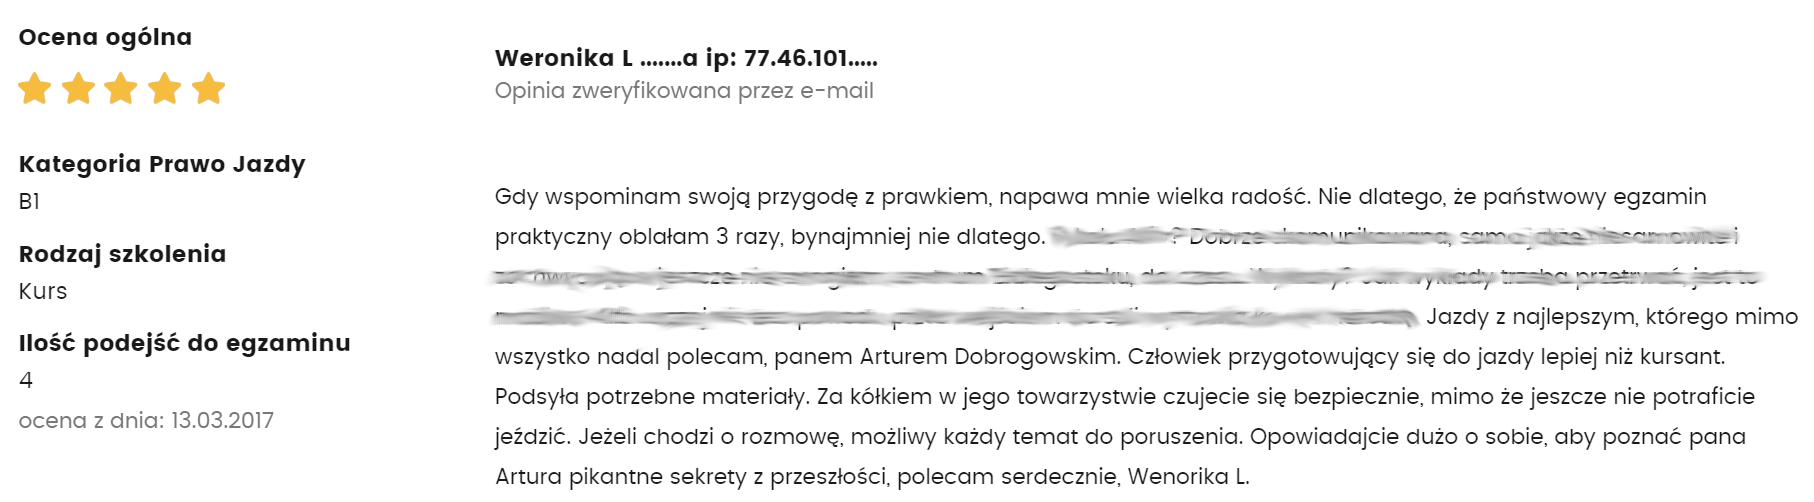 weronika lubowicka